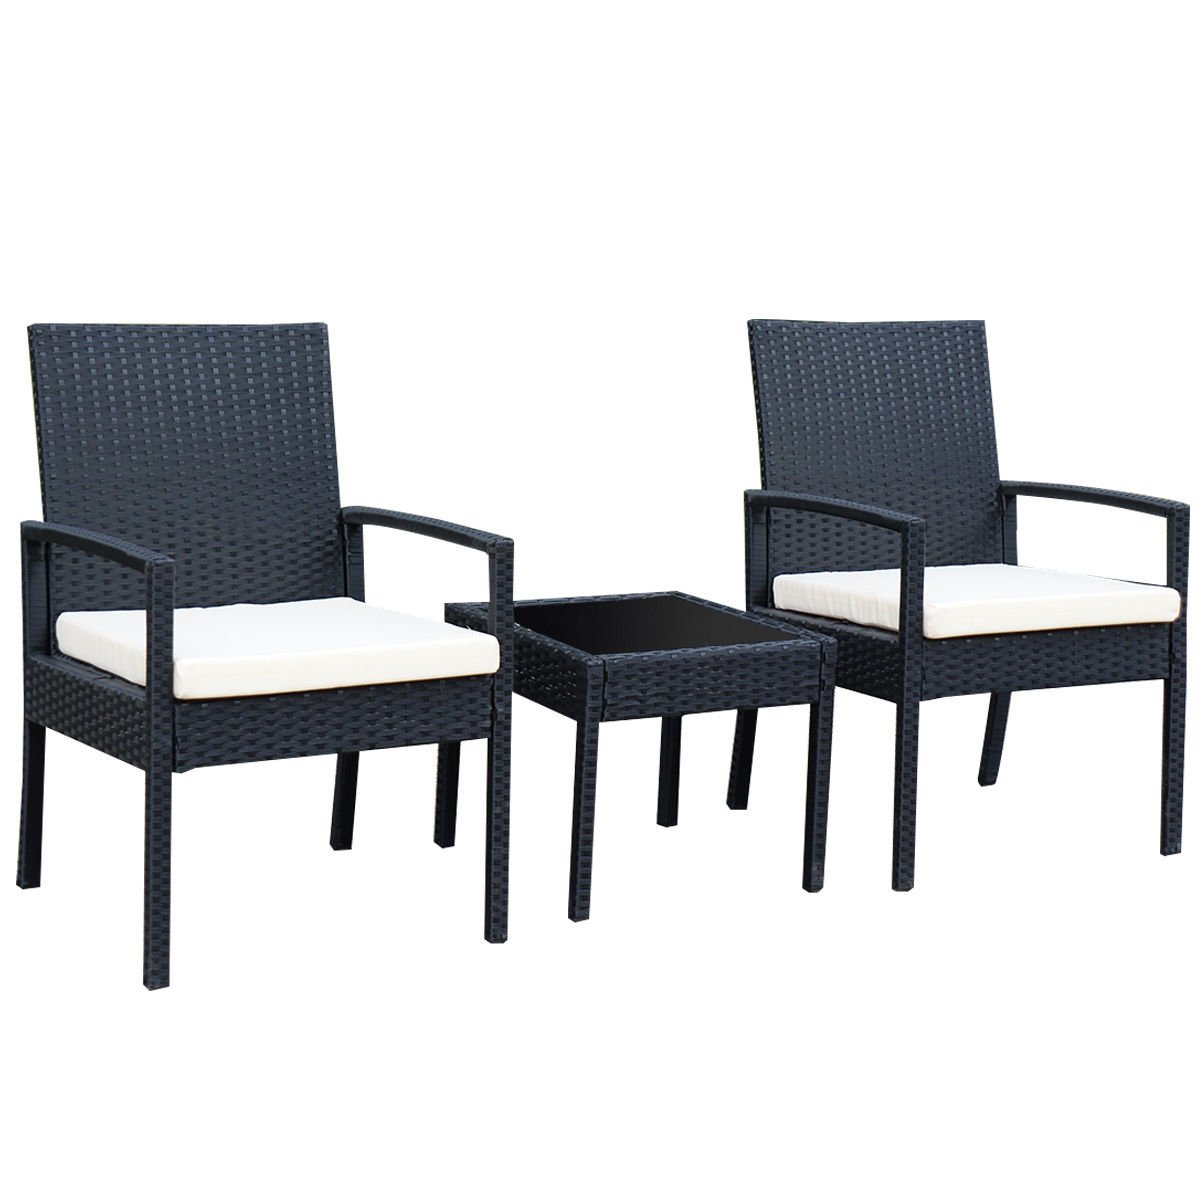 Tangkula 3 PCS Outdoor Rattan Patio Furniture Set Backyard Garden Furniture Seat Cushioned (black)